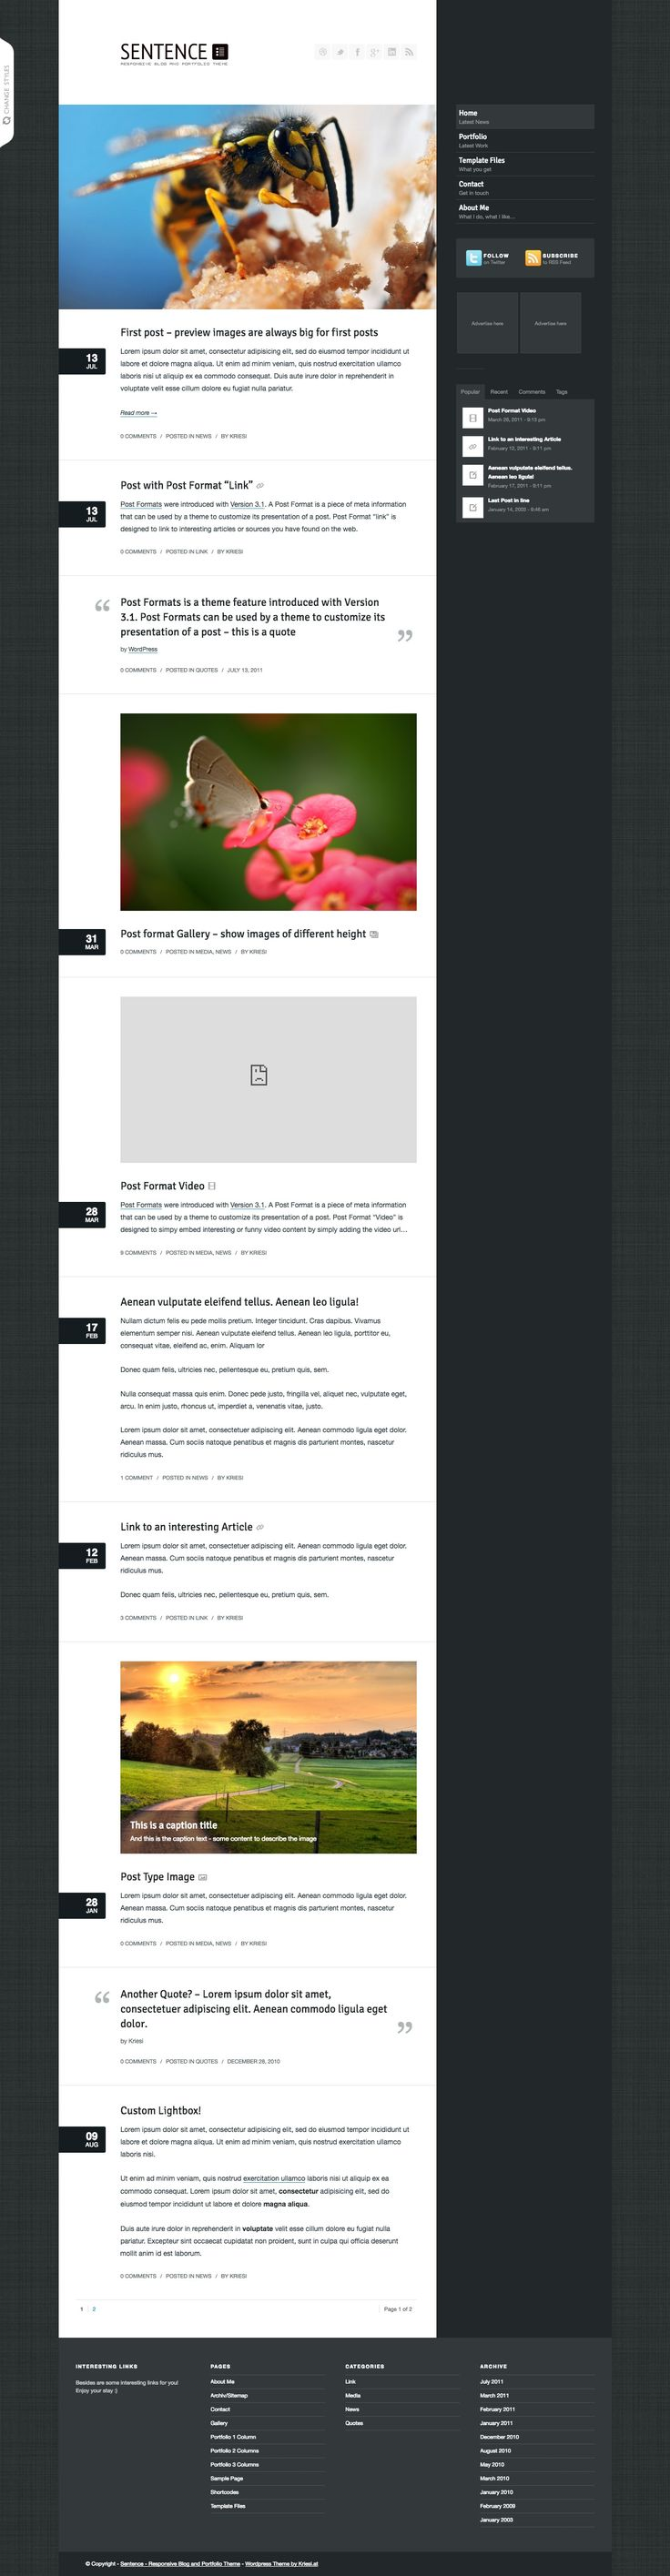 Sentence is a responsive Blog and Portfolio Theme